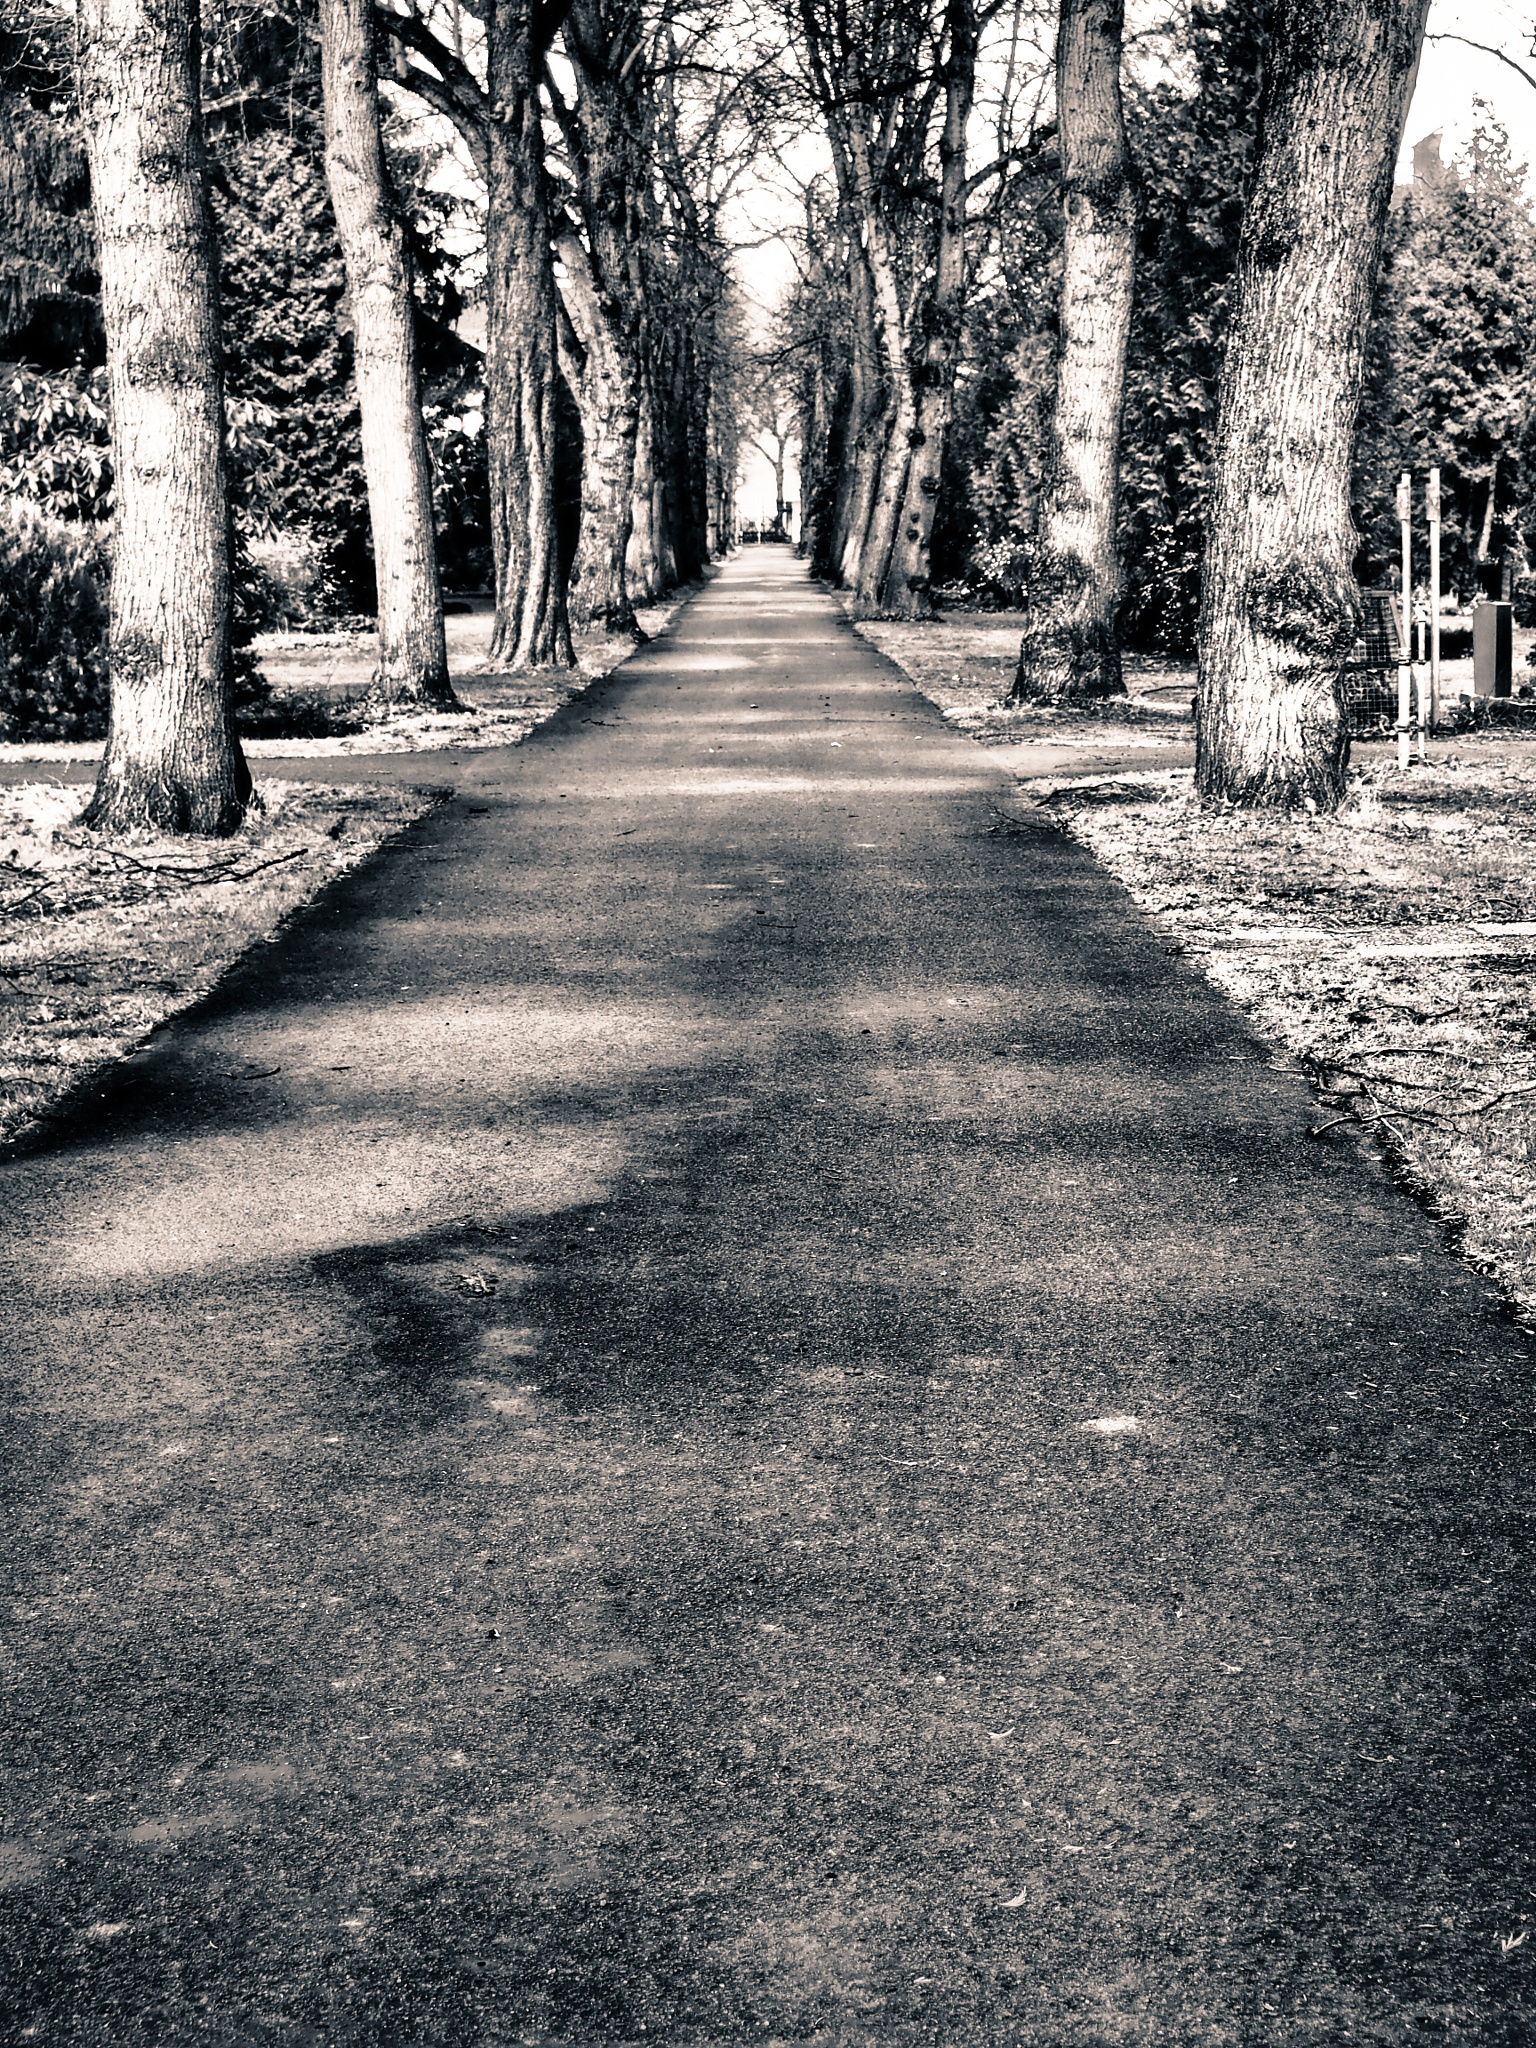 Berlin Tree Avenue Black & White  by Jeans Brown Photography / Jens Schwarz